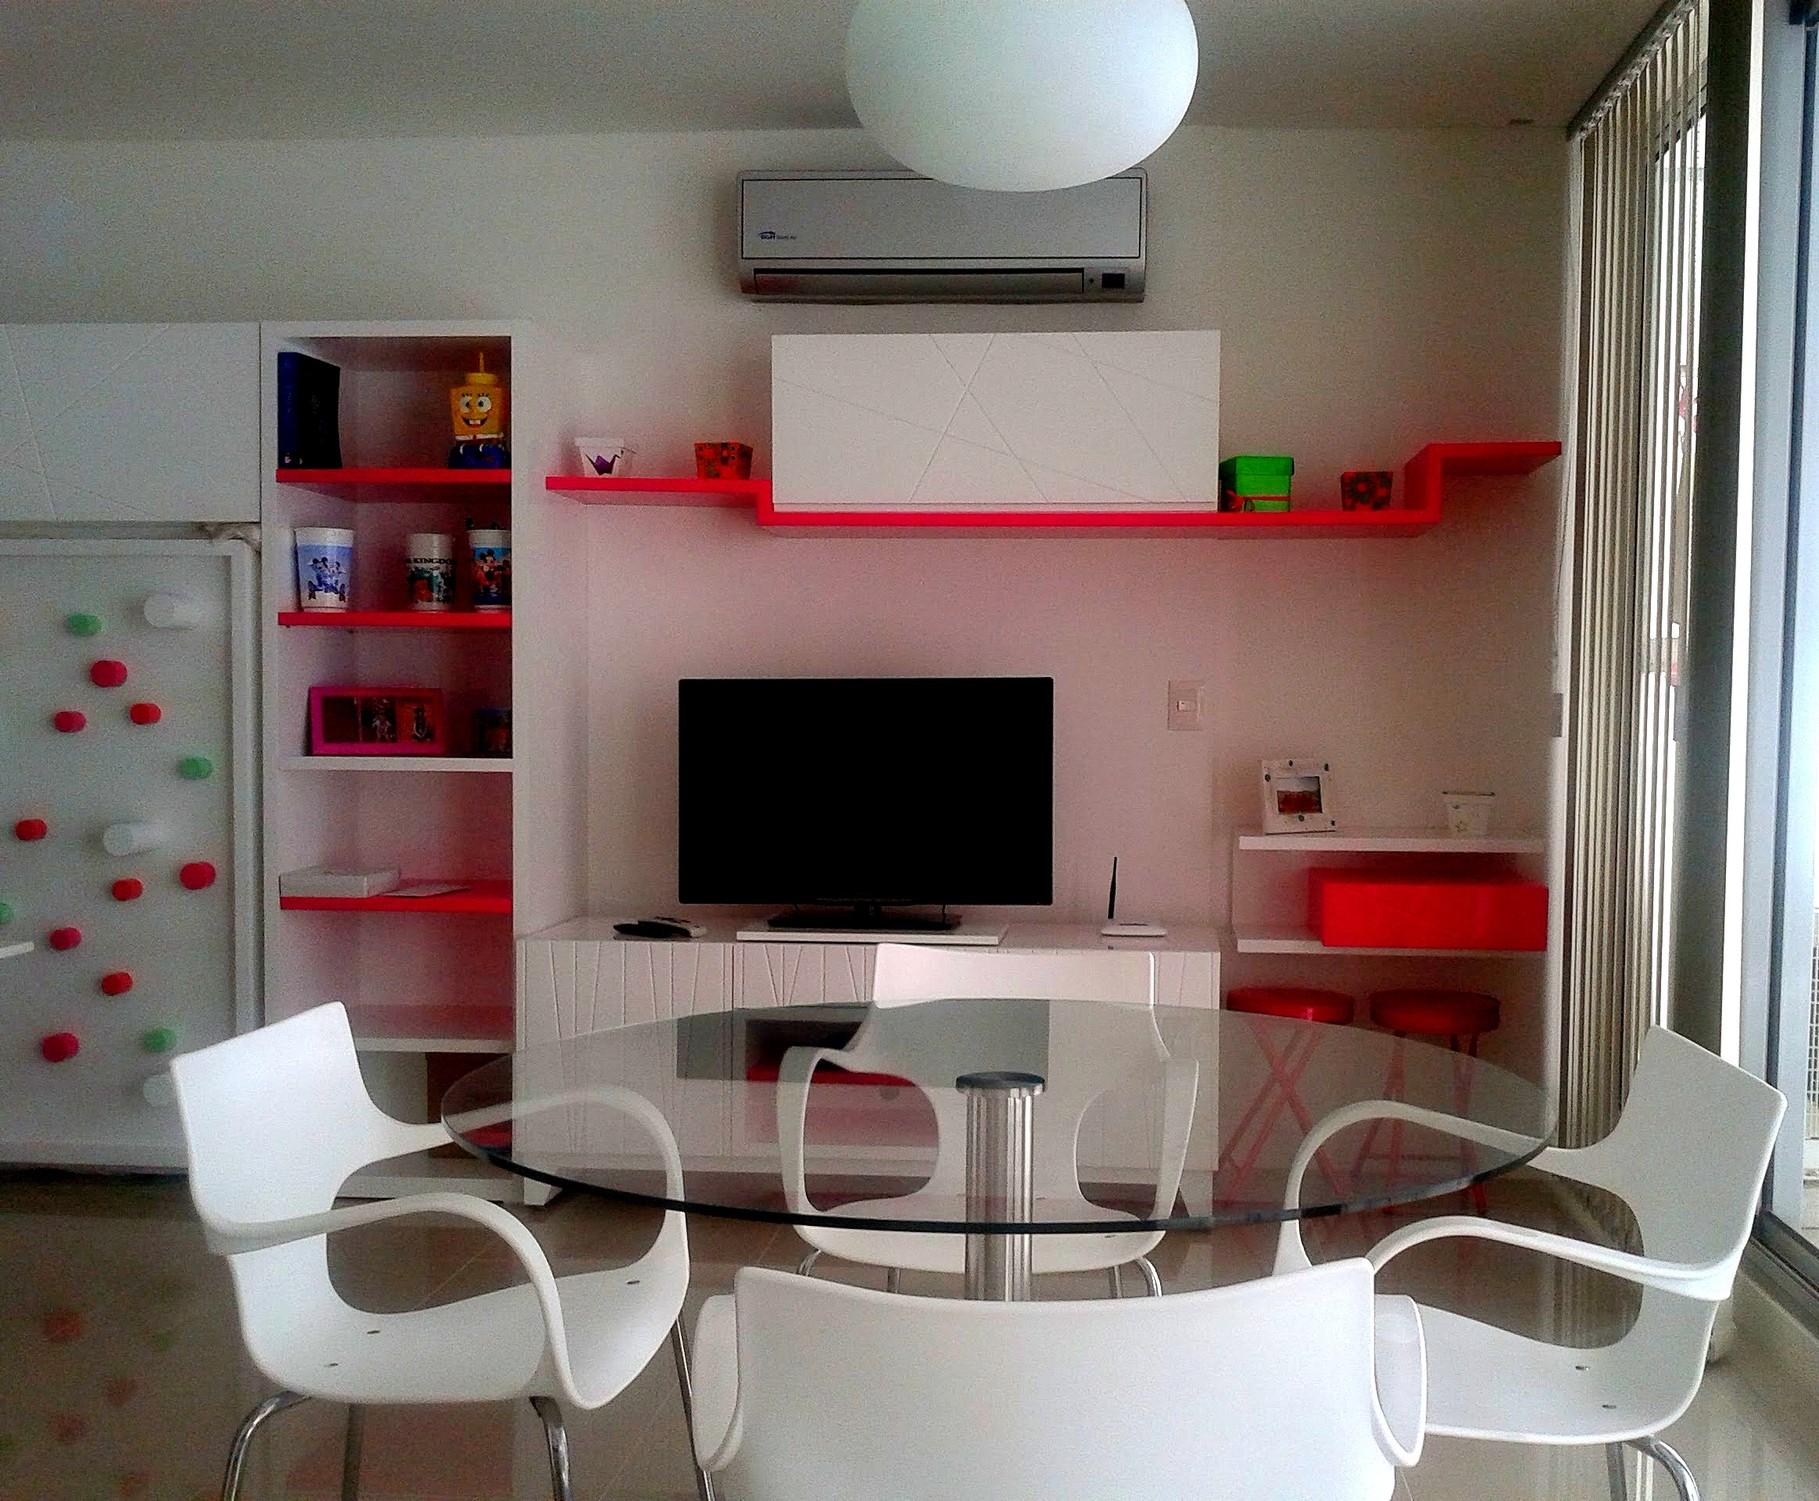 Dise o de muebles y arquitectura rominasirianni for App diseno de muebles